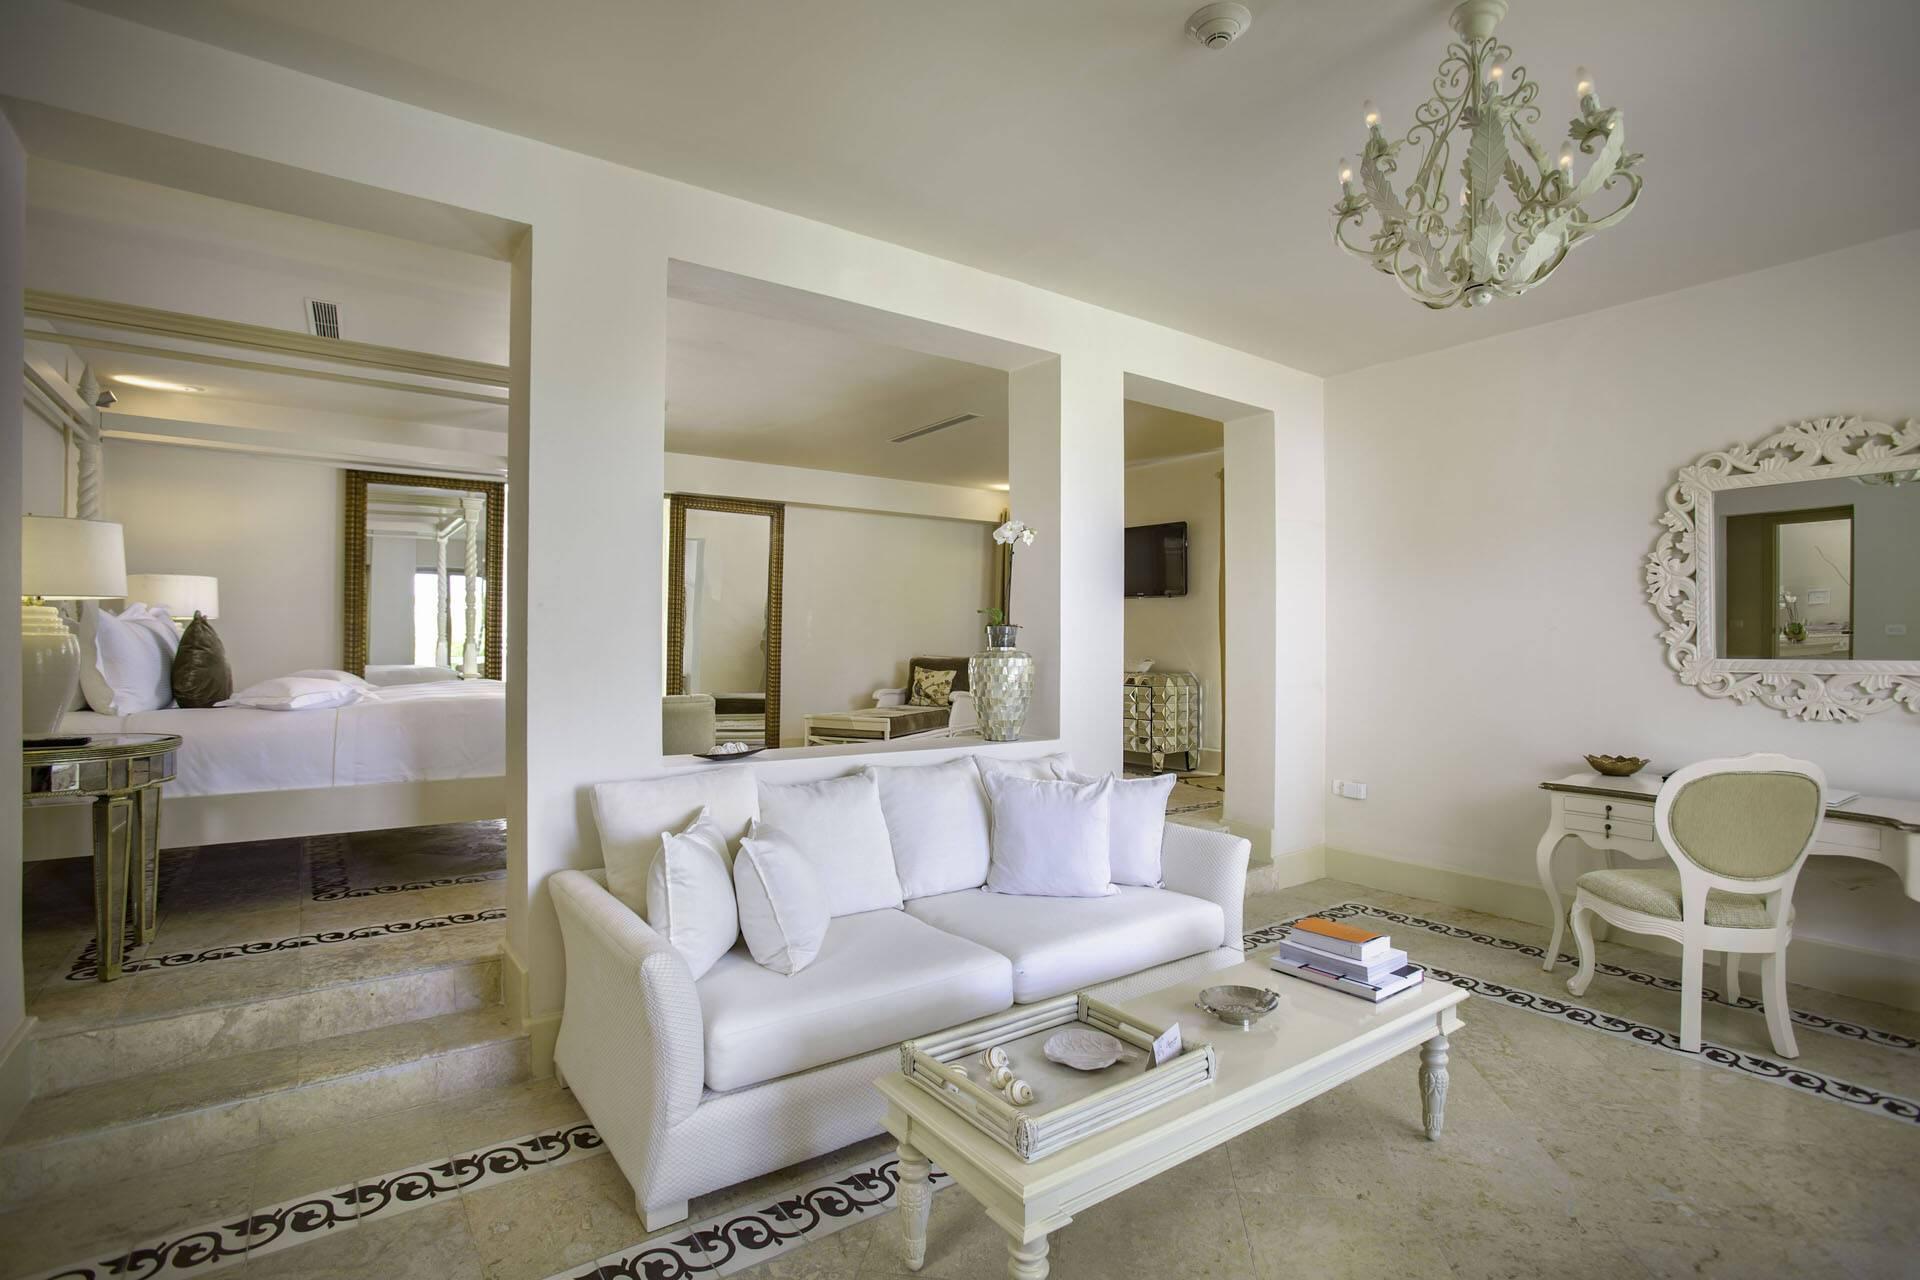 Eden Roc Cap Cana Punta Cana Rep Republicaine Imperial Villa Living Room